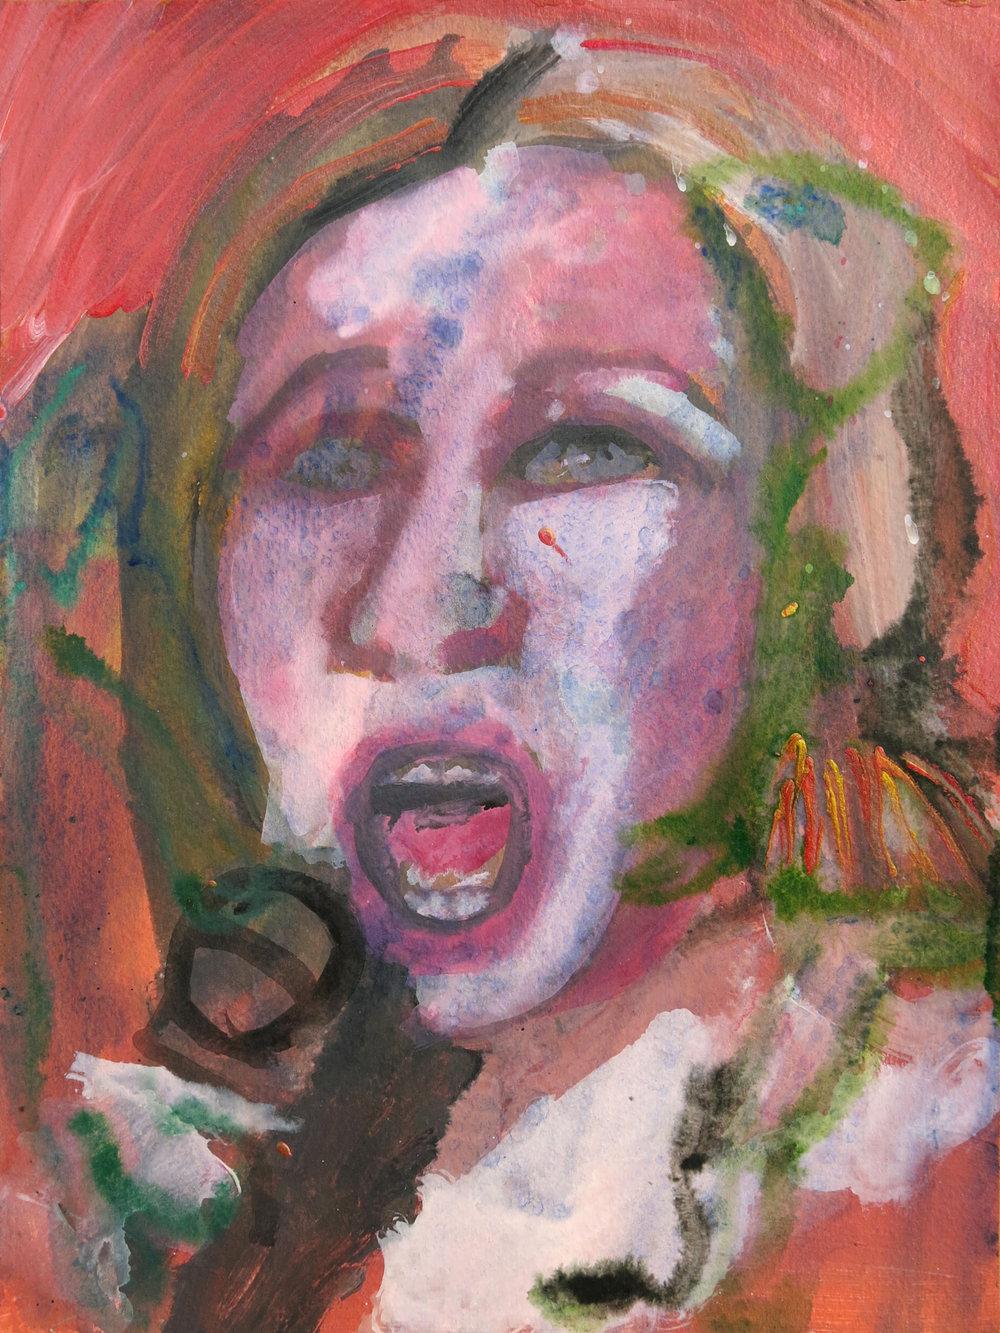 Barbra Streisand Portrait #34